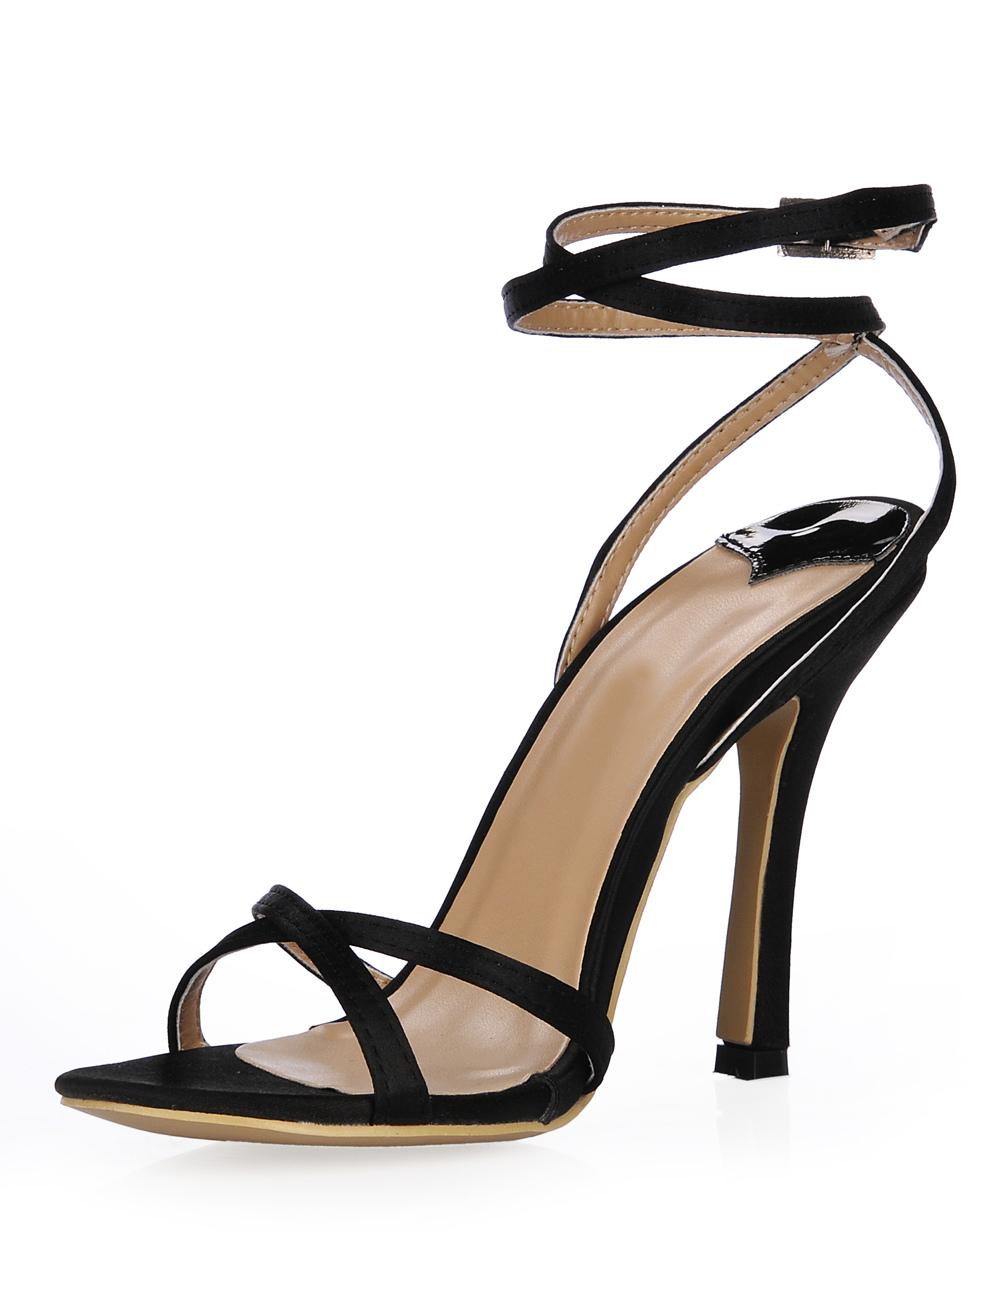 Imitated Silk Dress Sandals